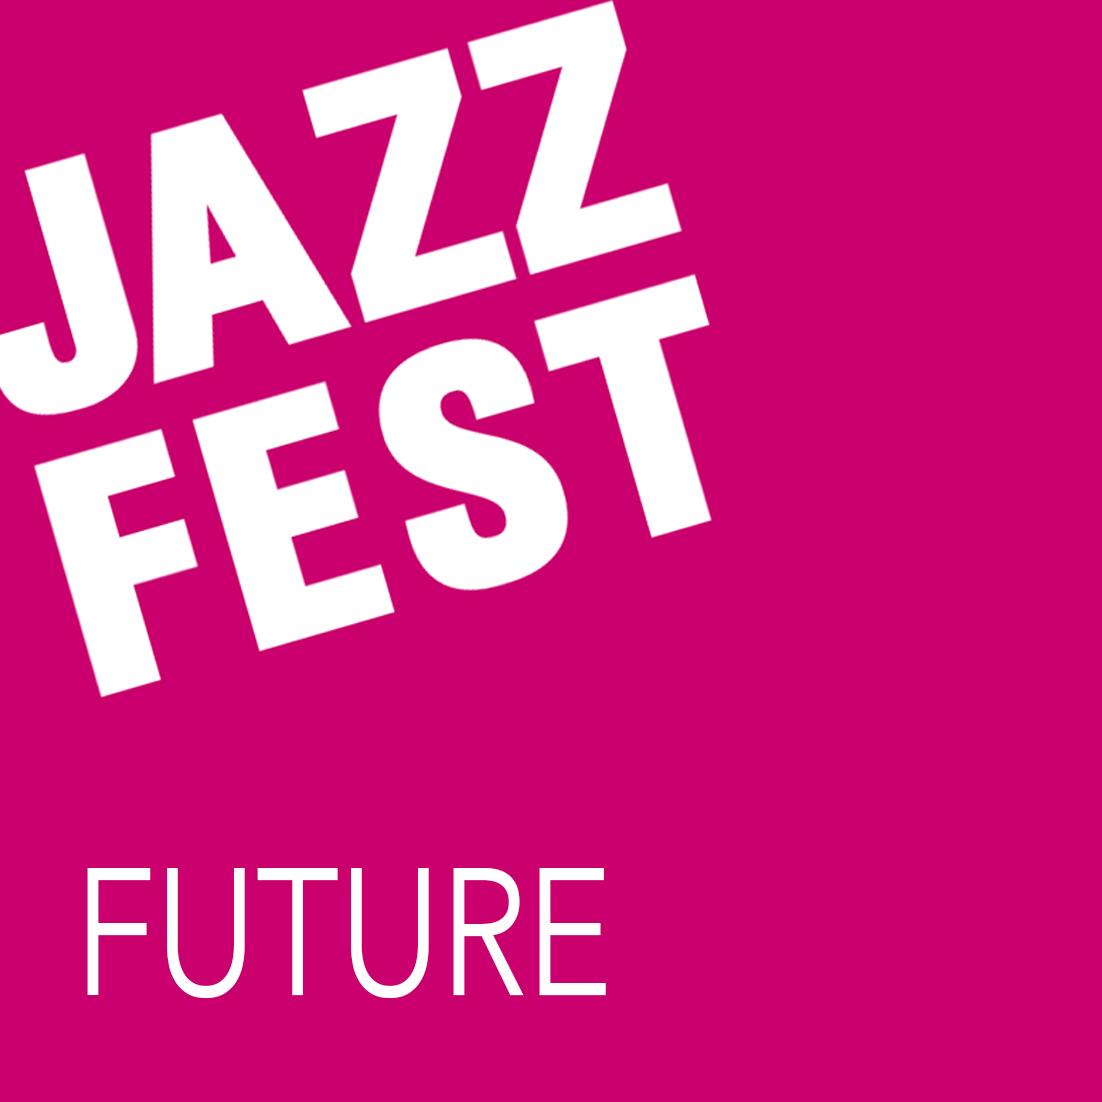 JazzfestFutureLogo1.jpg